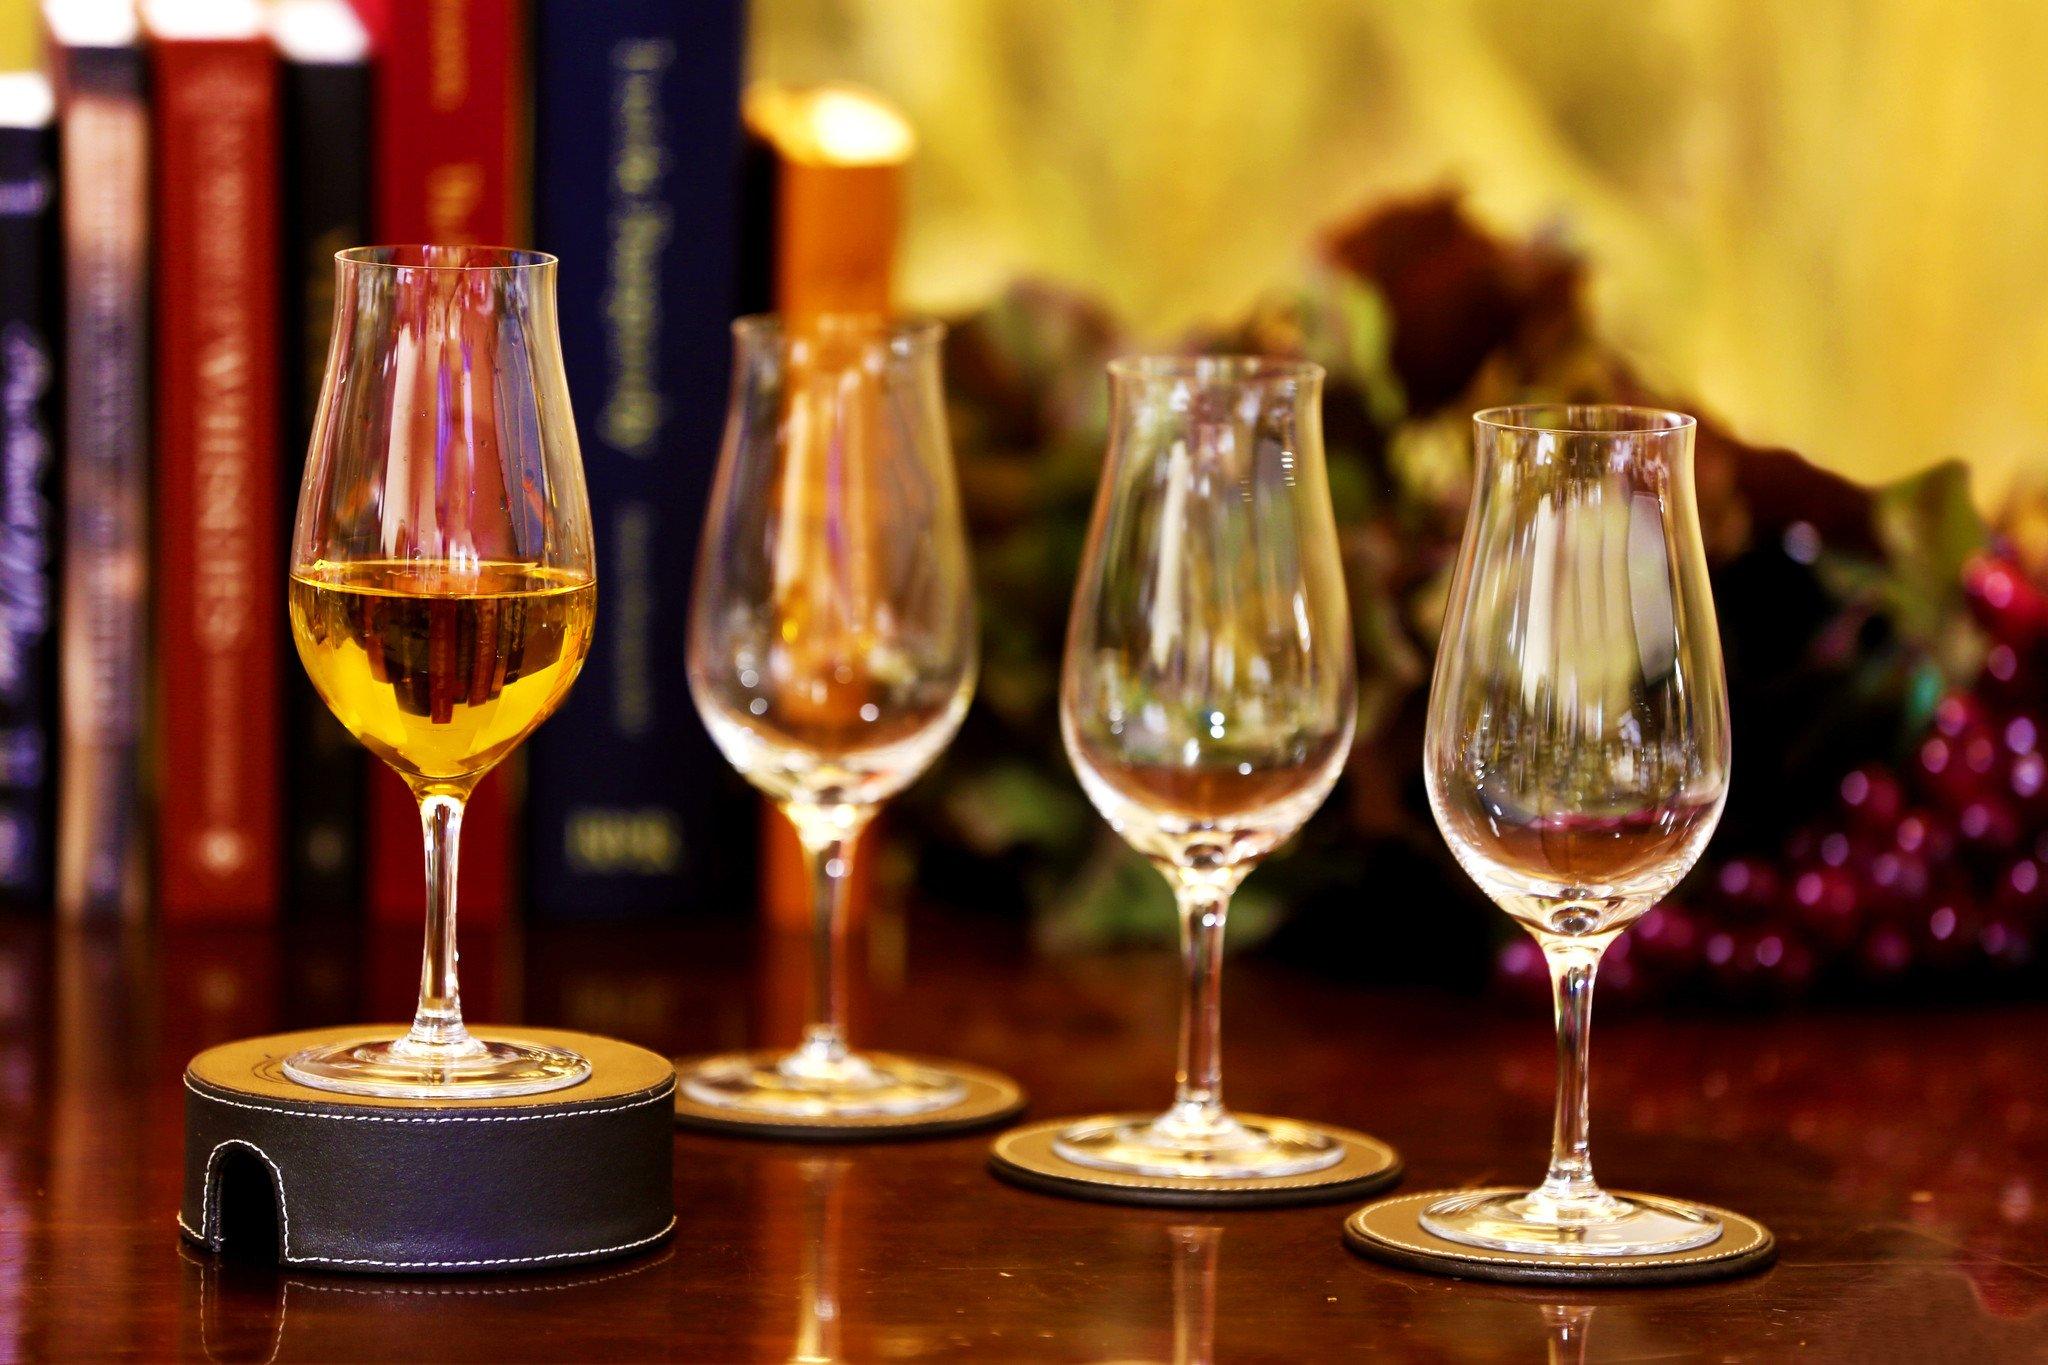 Ravenscroft Crystal 14-Ounce Cognac/Single Malt Scotch Snifter, 7-1/2-Inch, Set of 4 by Ravenscroft Crystal (Image #2)